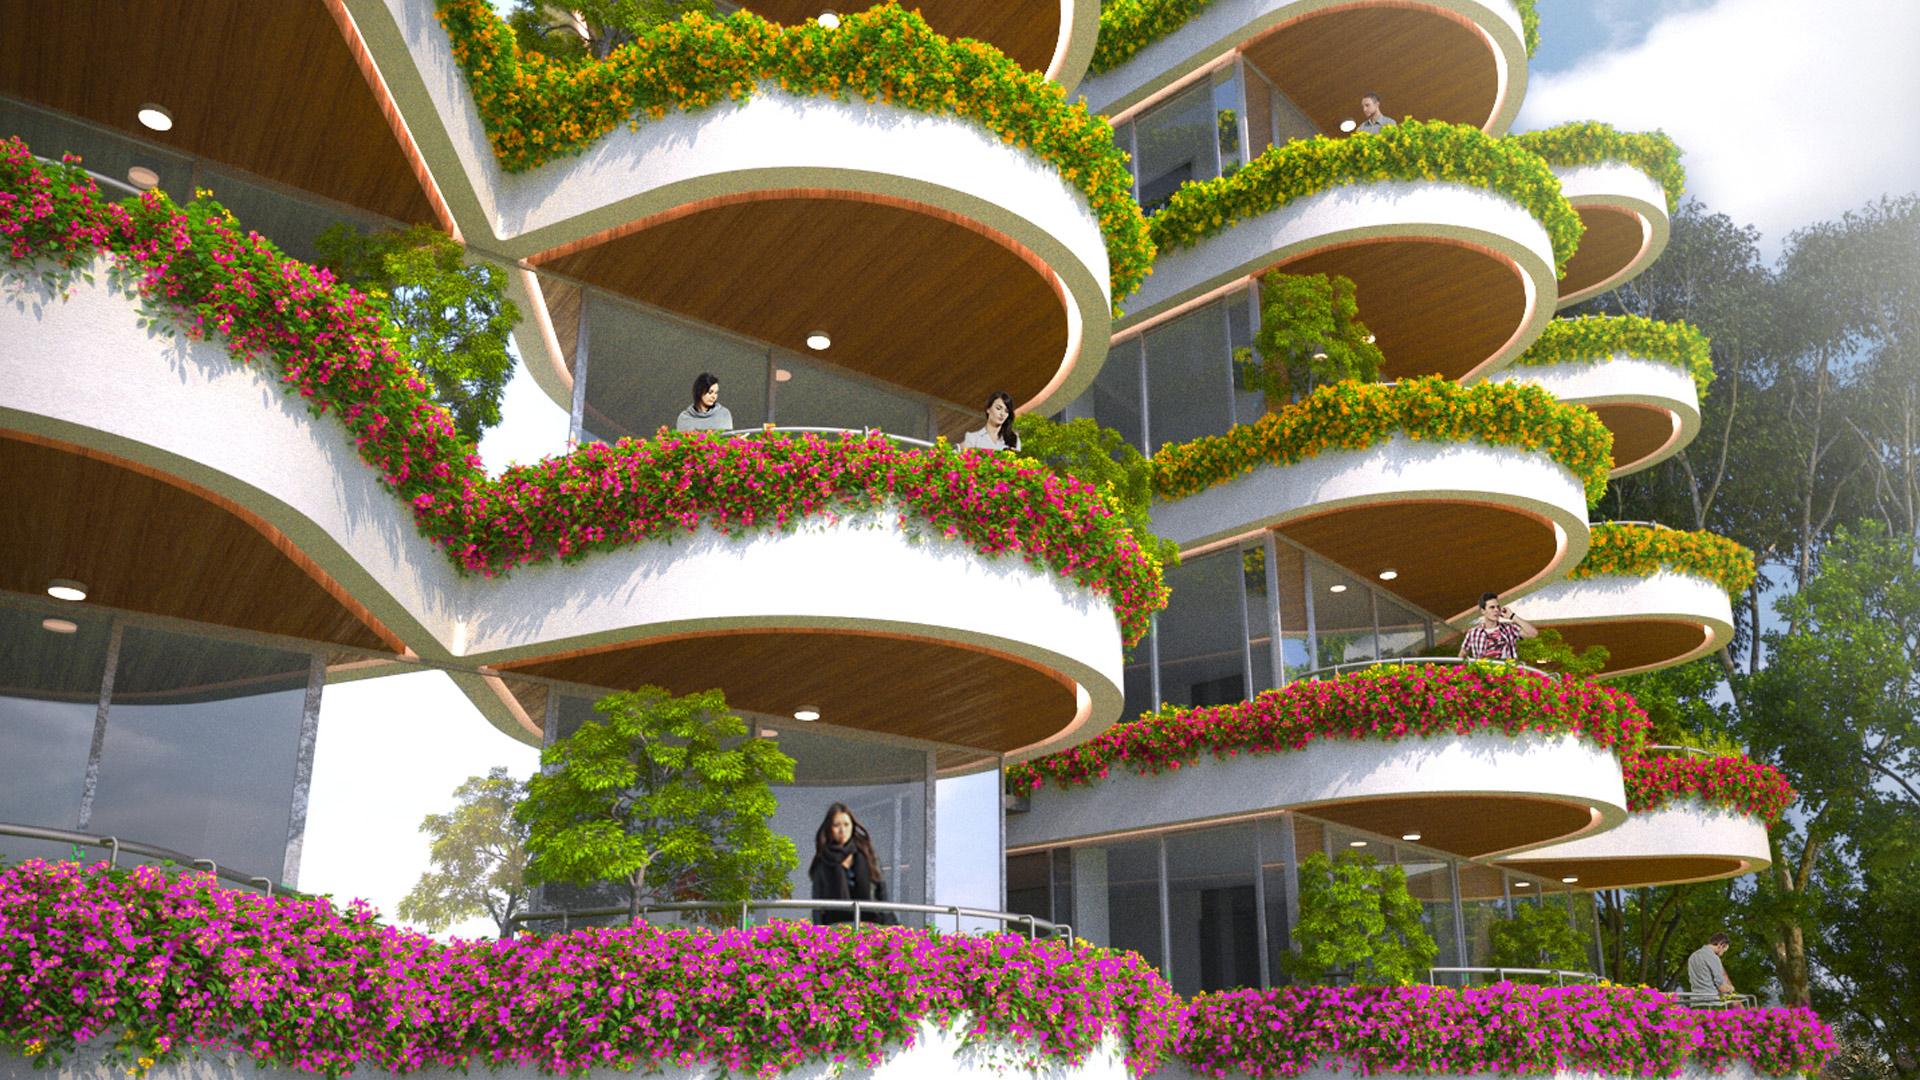 MAP_Design_Residential_Apartment_Architect_Kiran_Mathema_Green_Architecture_Balcony